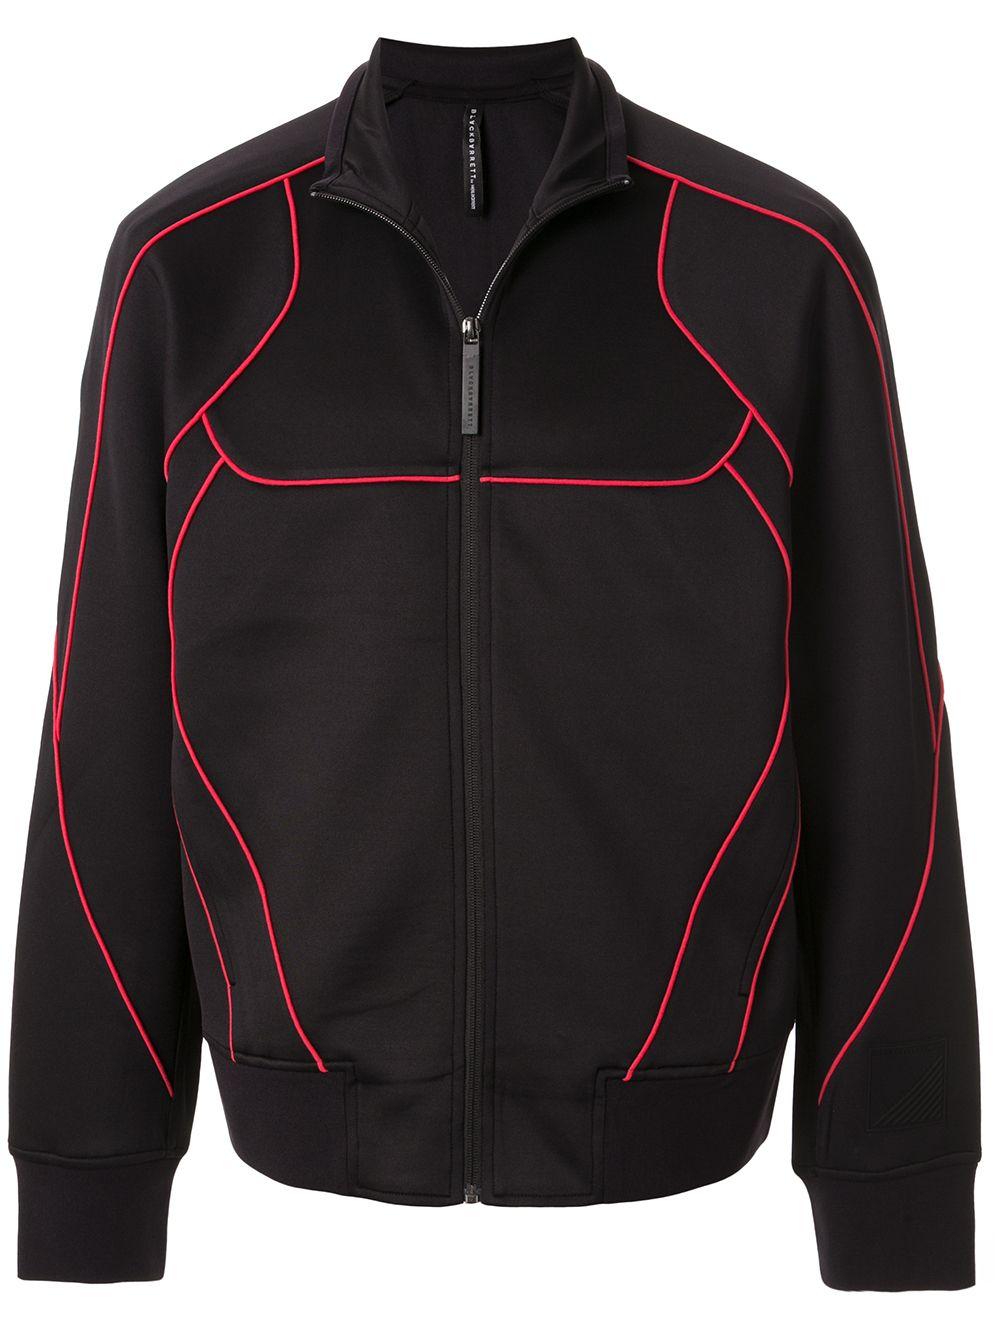 Blackbarrett Trainingsjacke mit Kontrastpaspeln - Schwarz